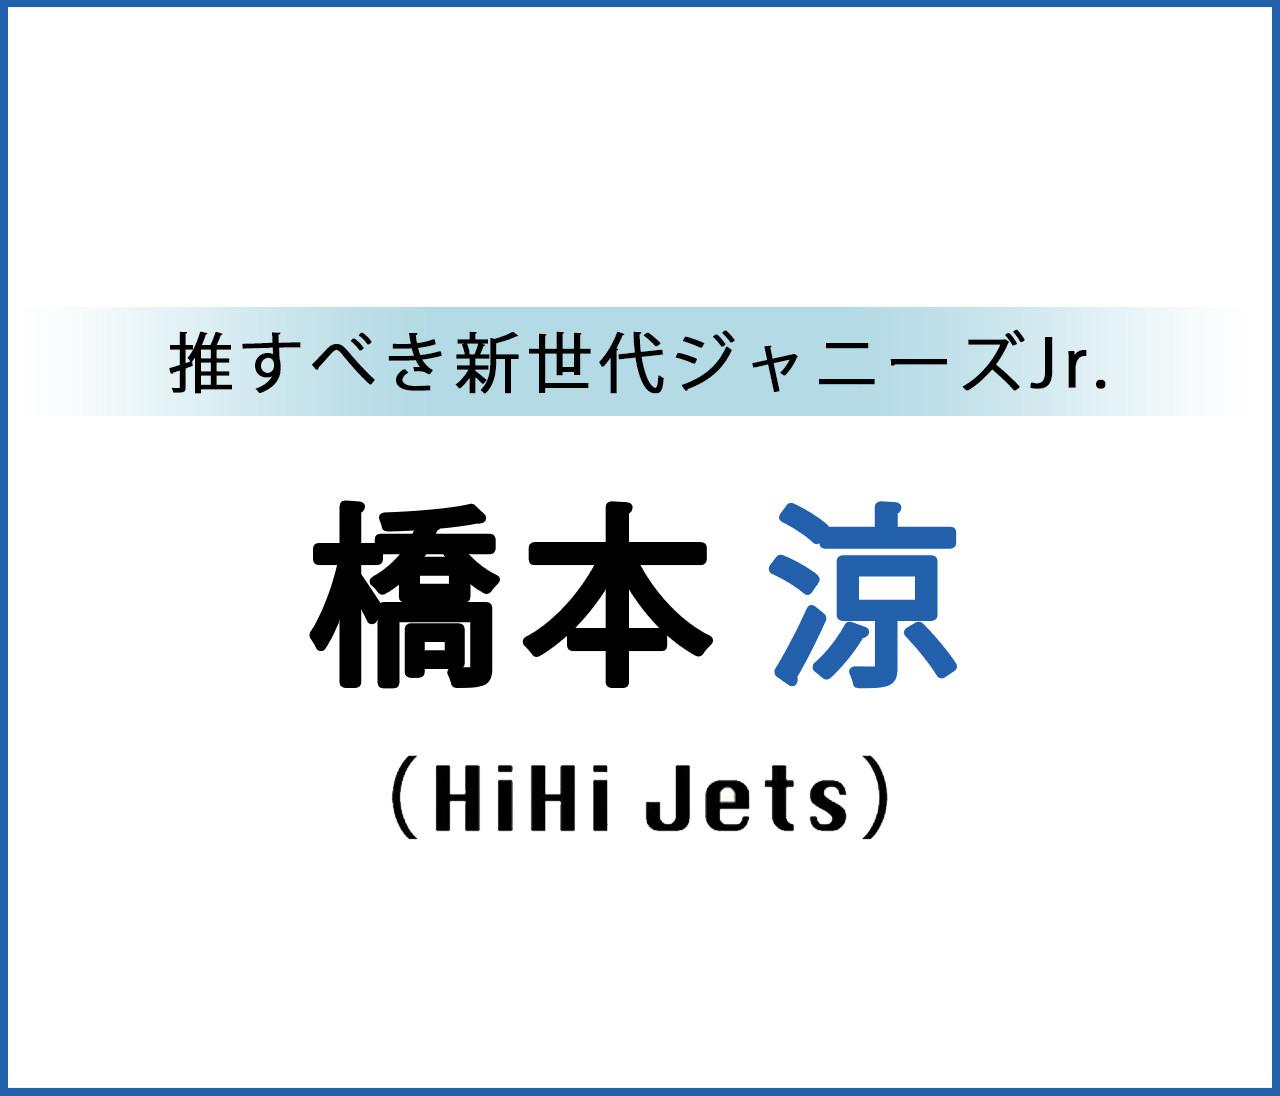 #HiHiJets #橋本涼 BAILA初登場スペシャルインタビュー!【新世代ジャニーズJr.】